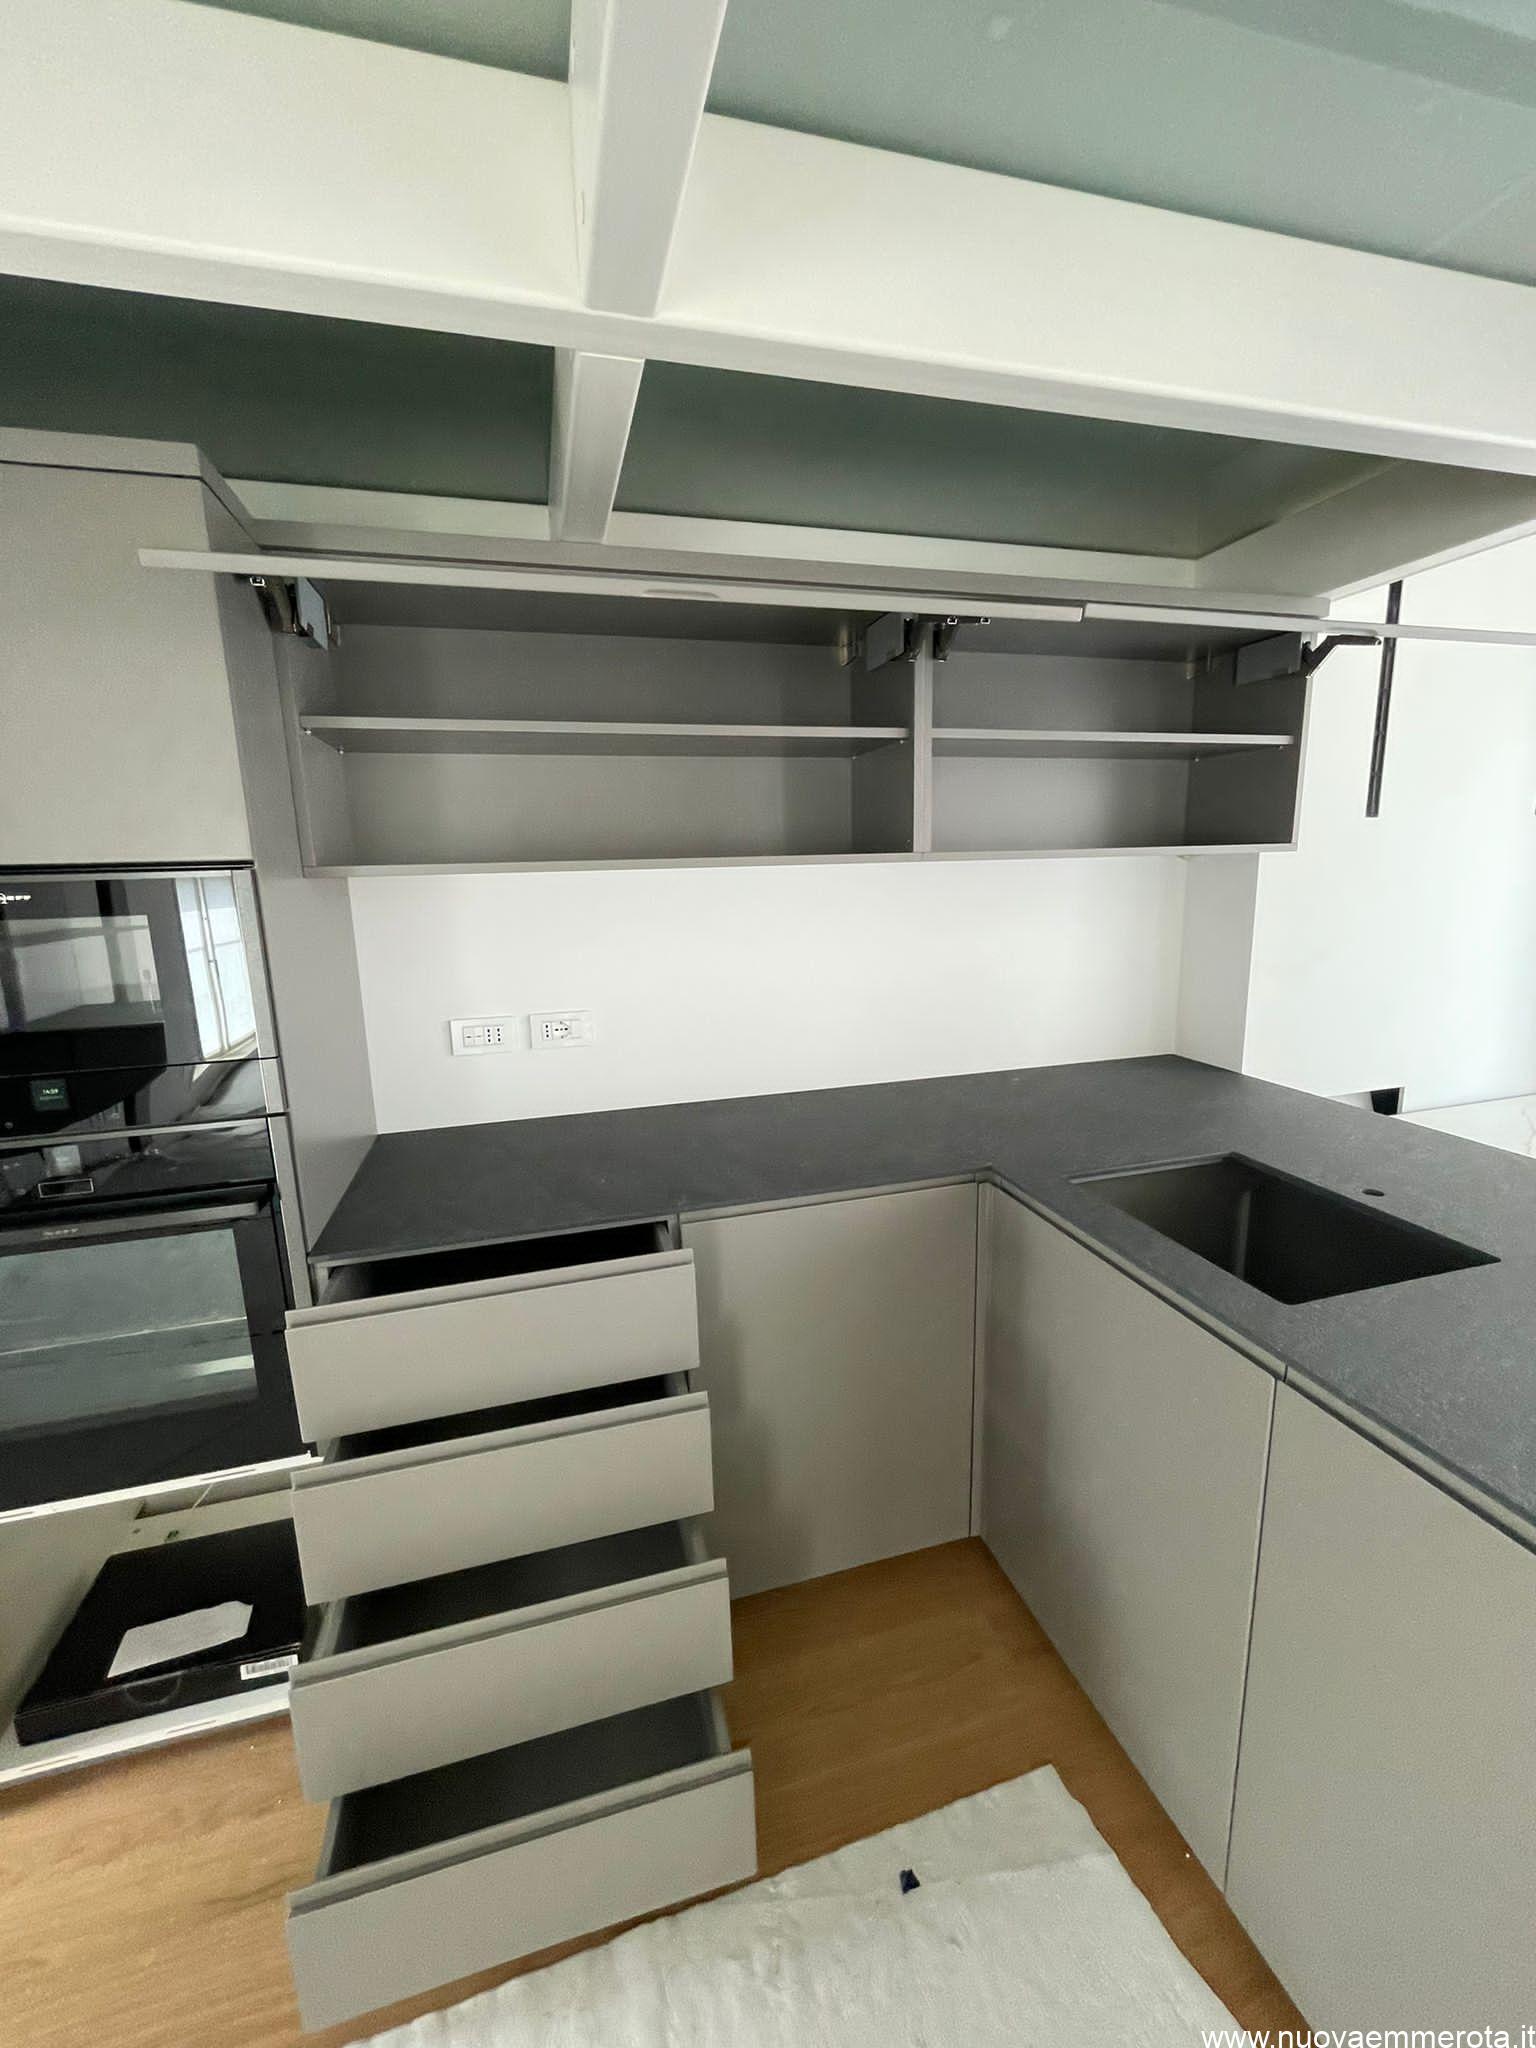 Cassetti e pensili aperti di una cucina su misura.